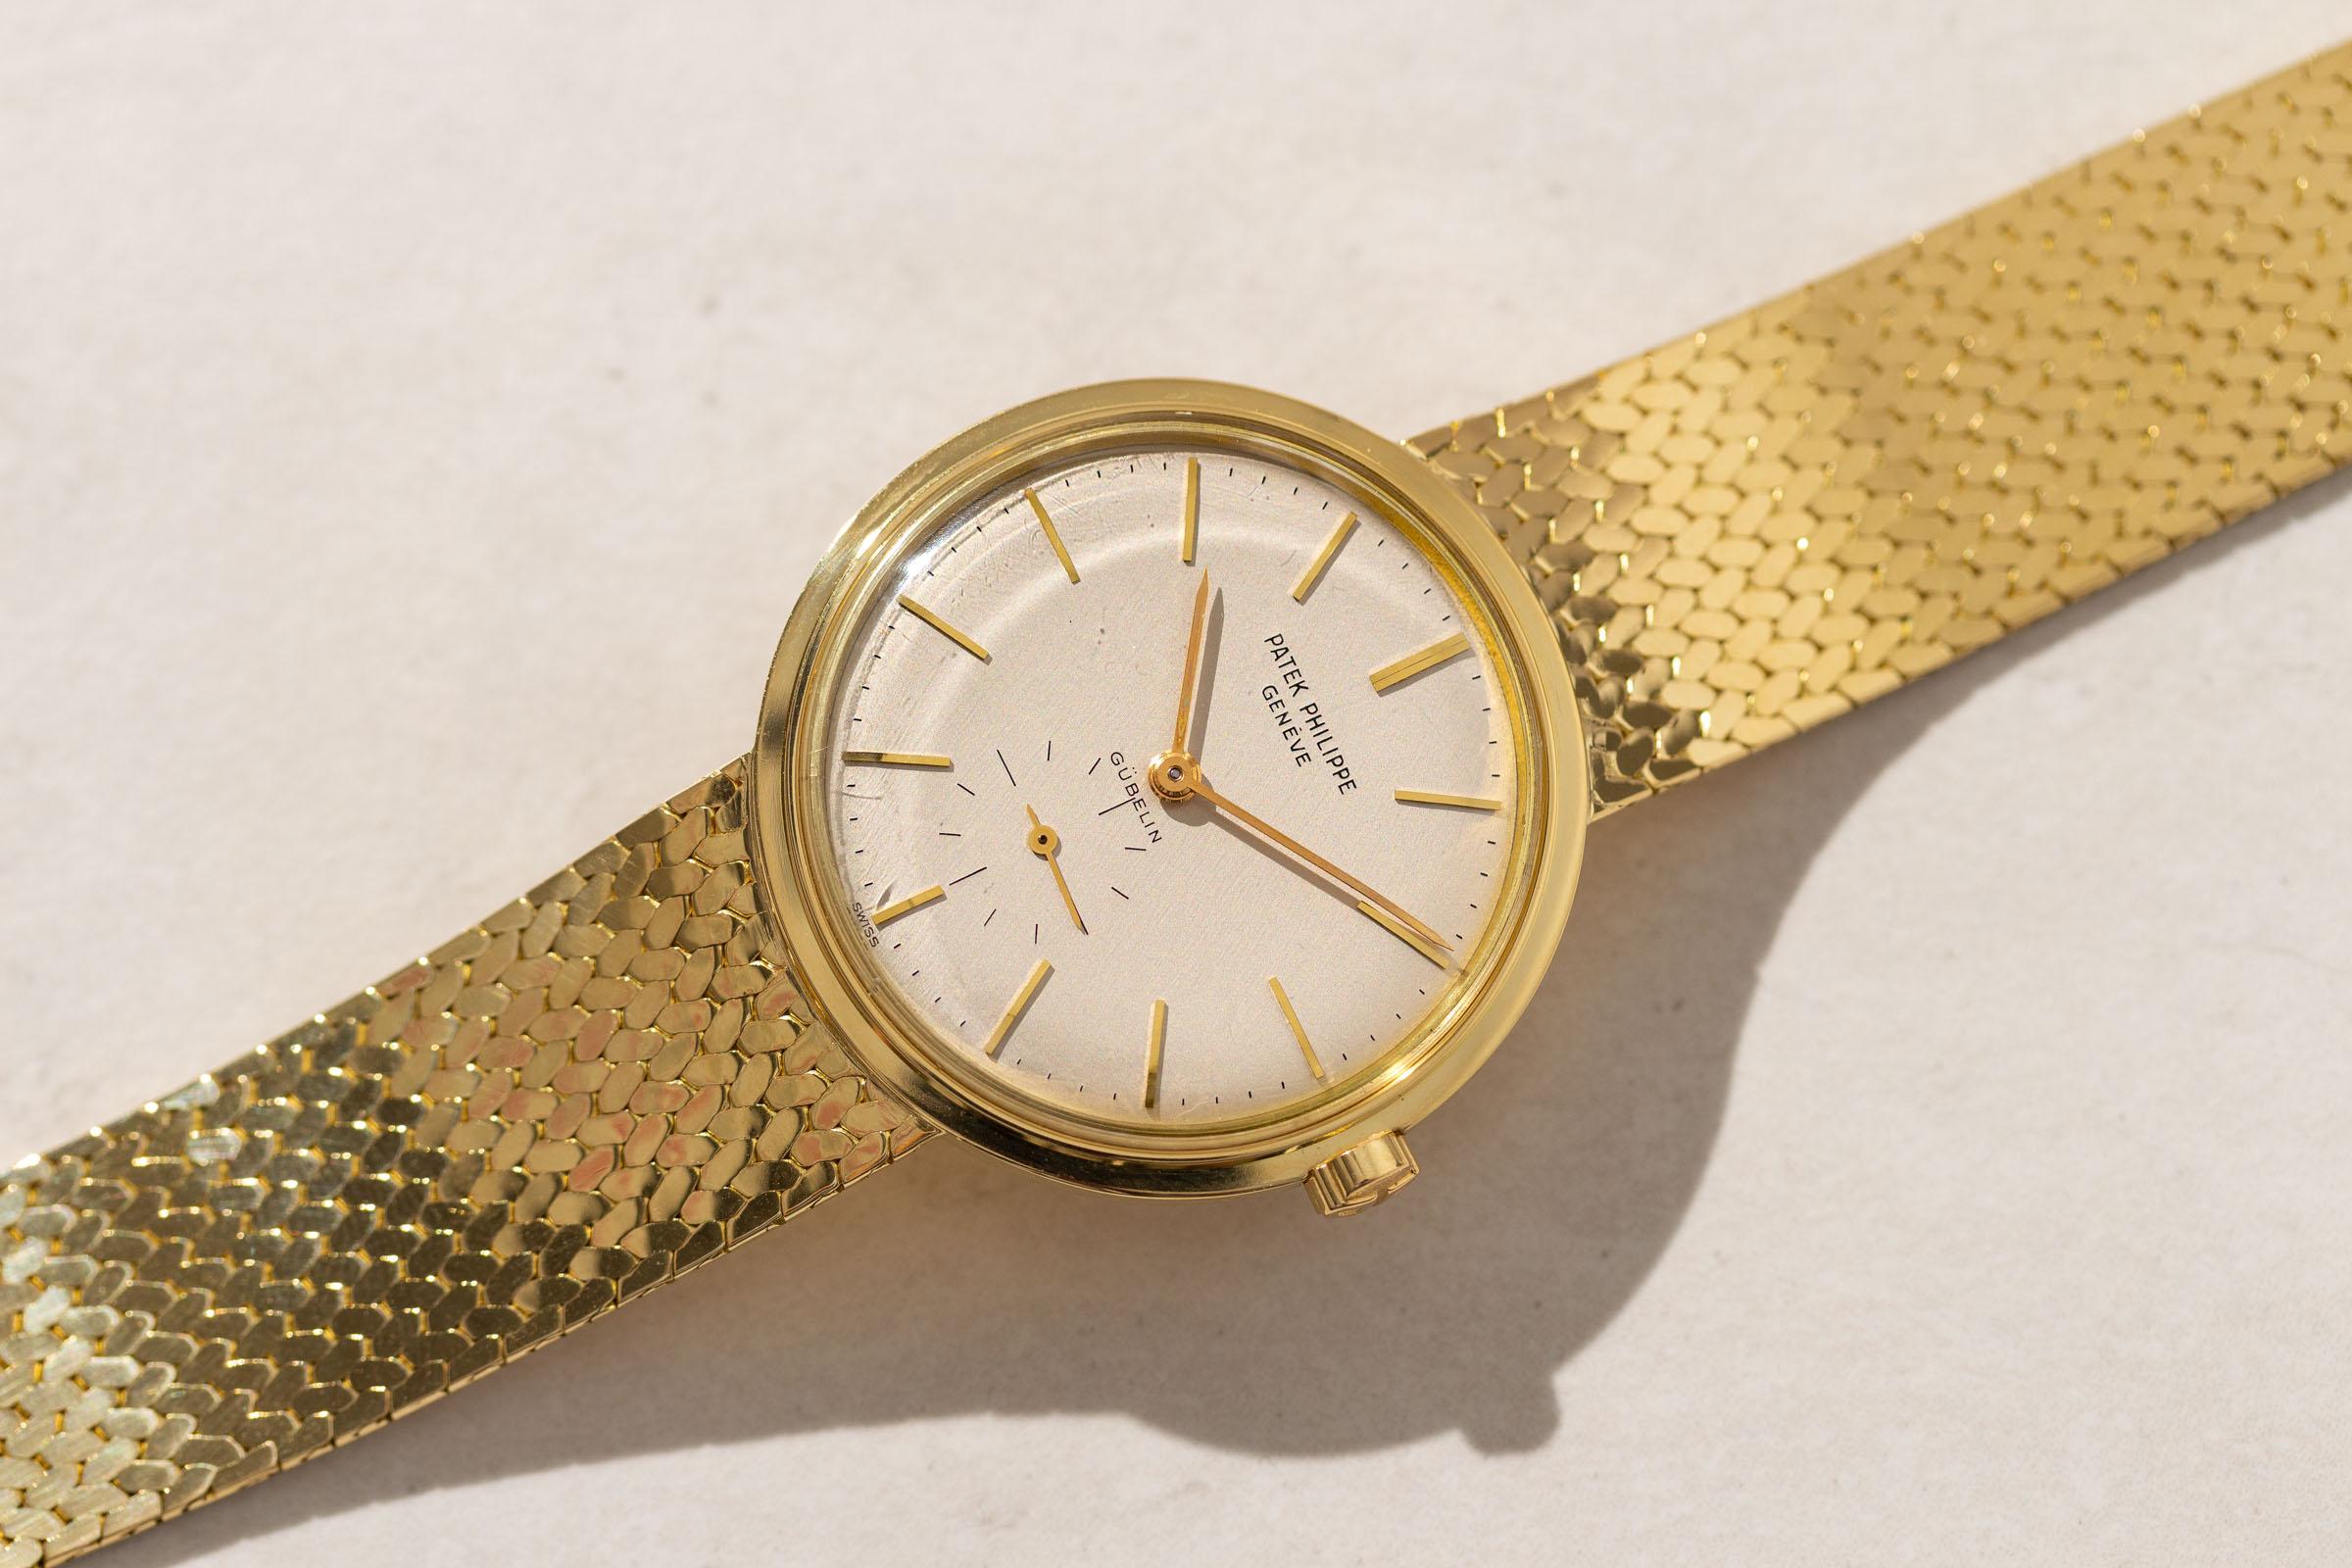 Patek Philippe Gold Vintage Watch